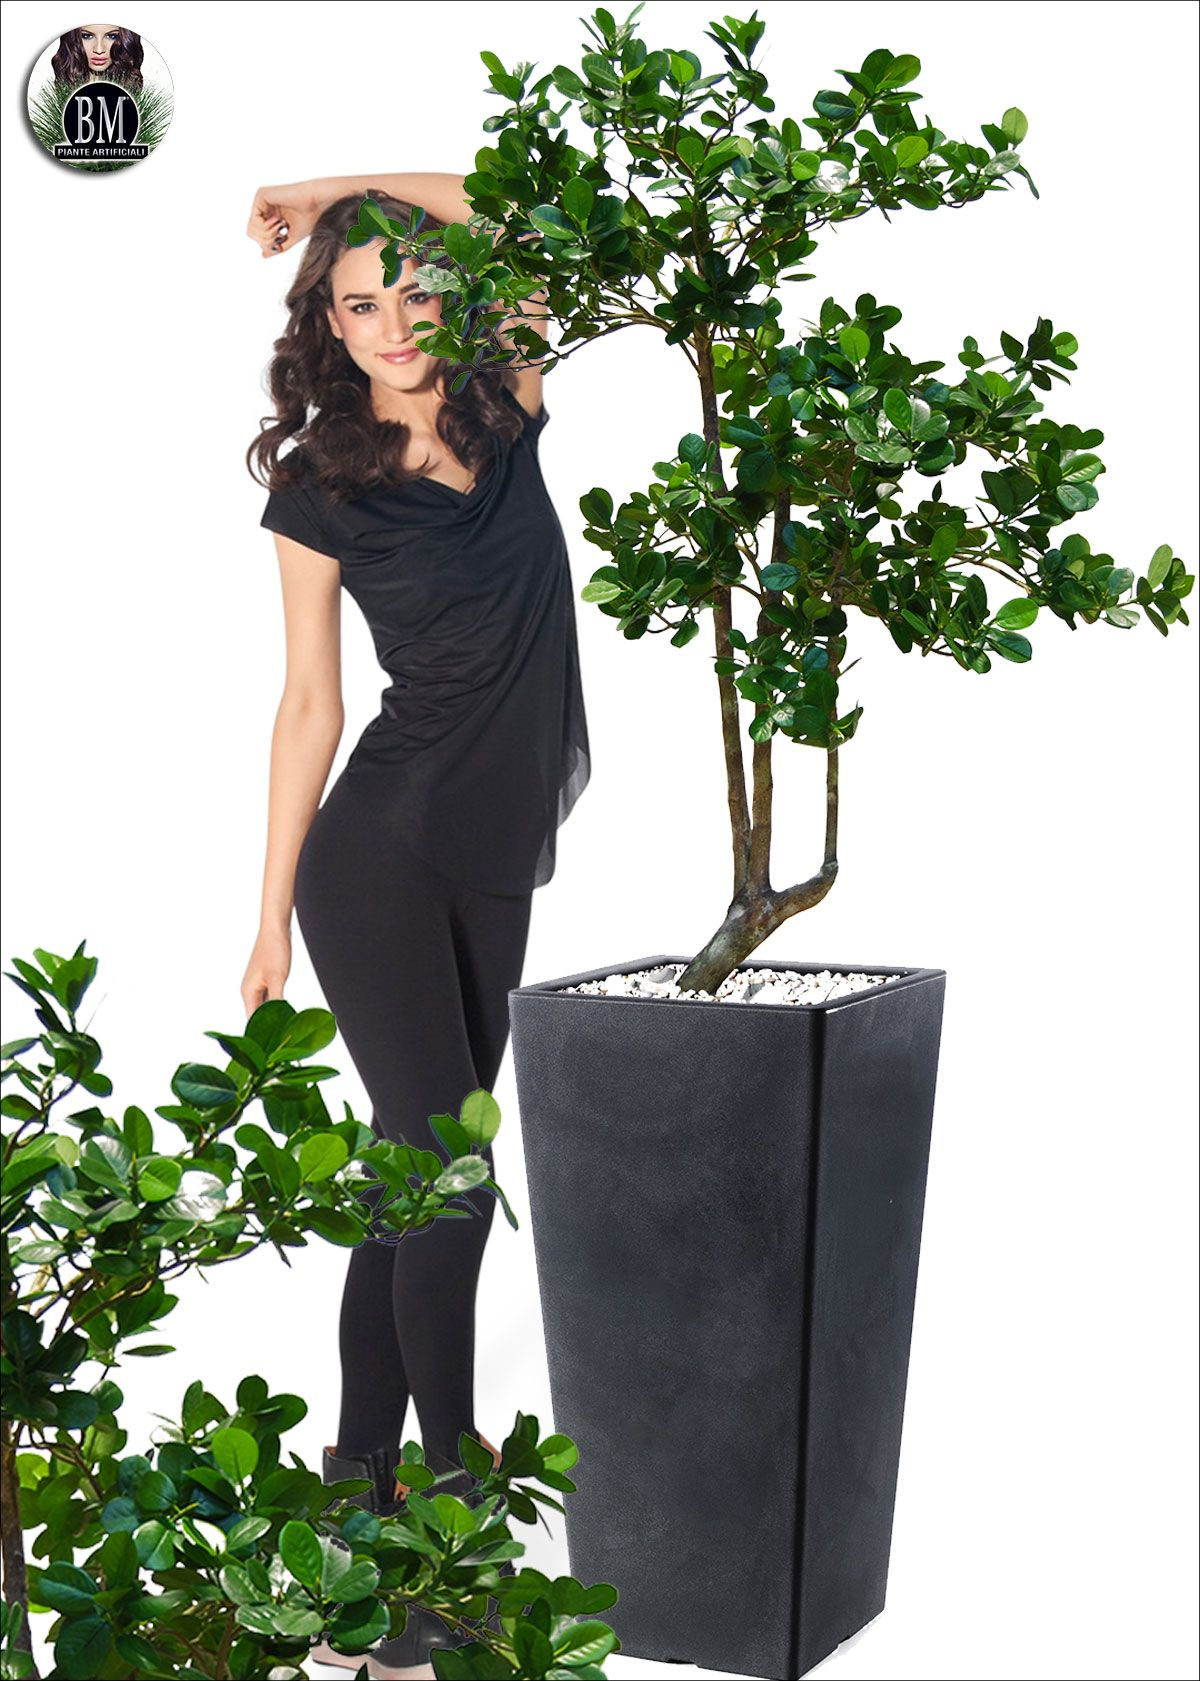 News 2015 BEST ARTIFICIAL PLANT